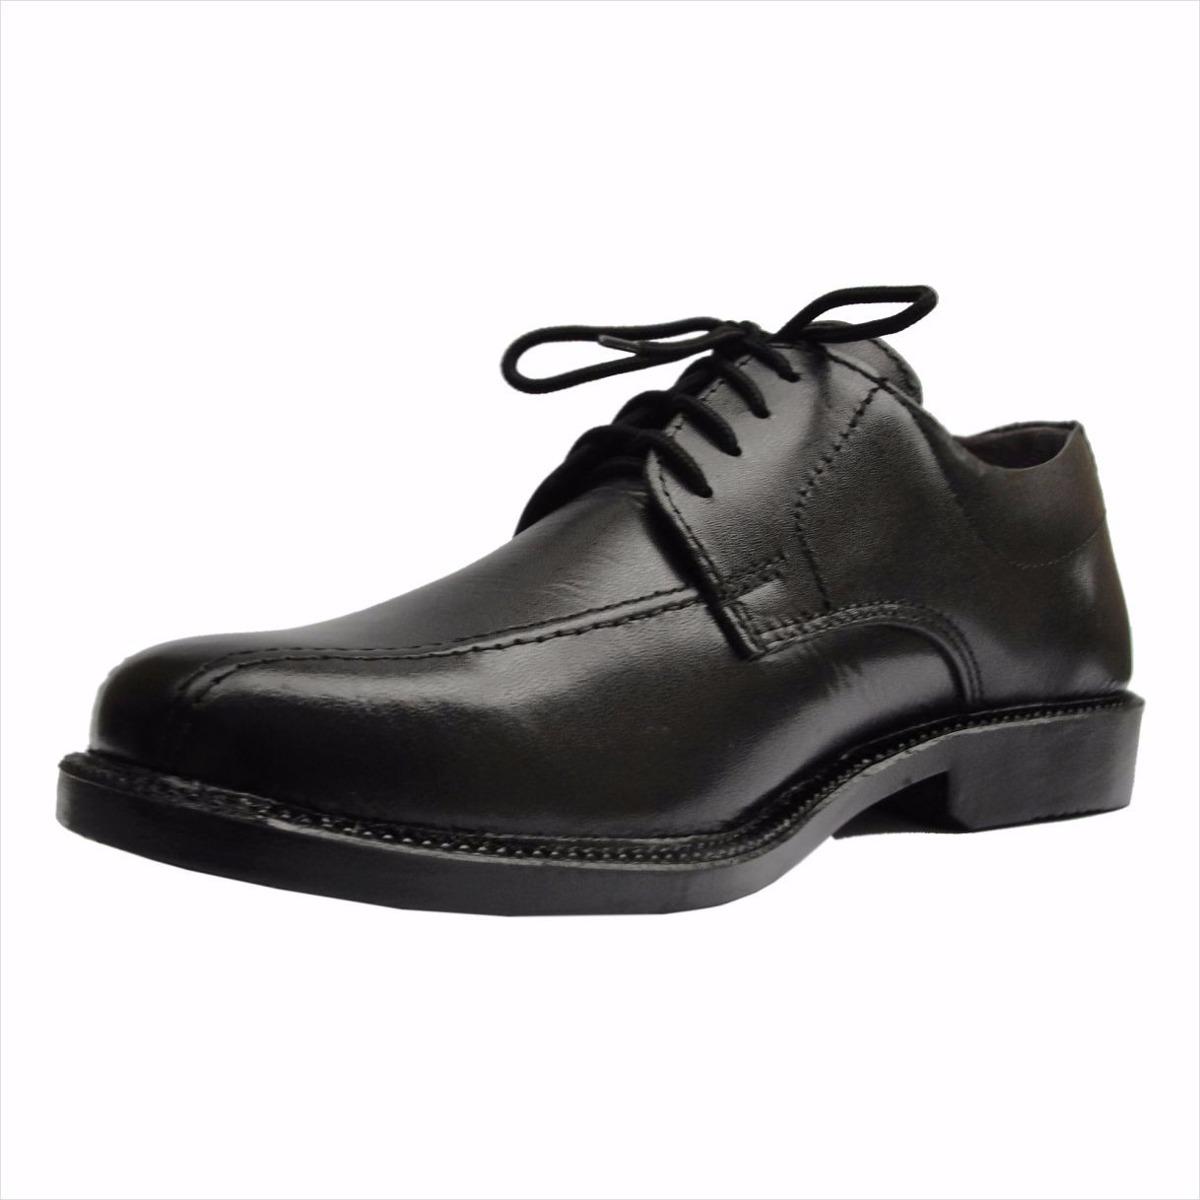 f4e2d323c sapato social tradicional, preto - mariano 557c9. Carregando zoom.